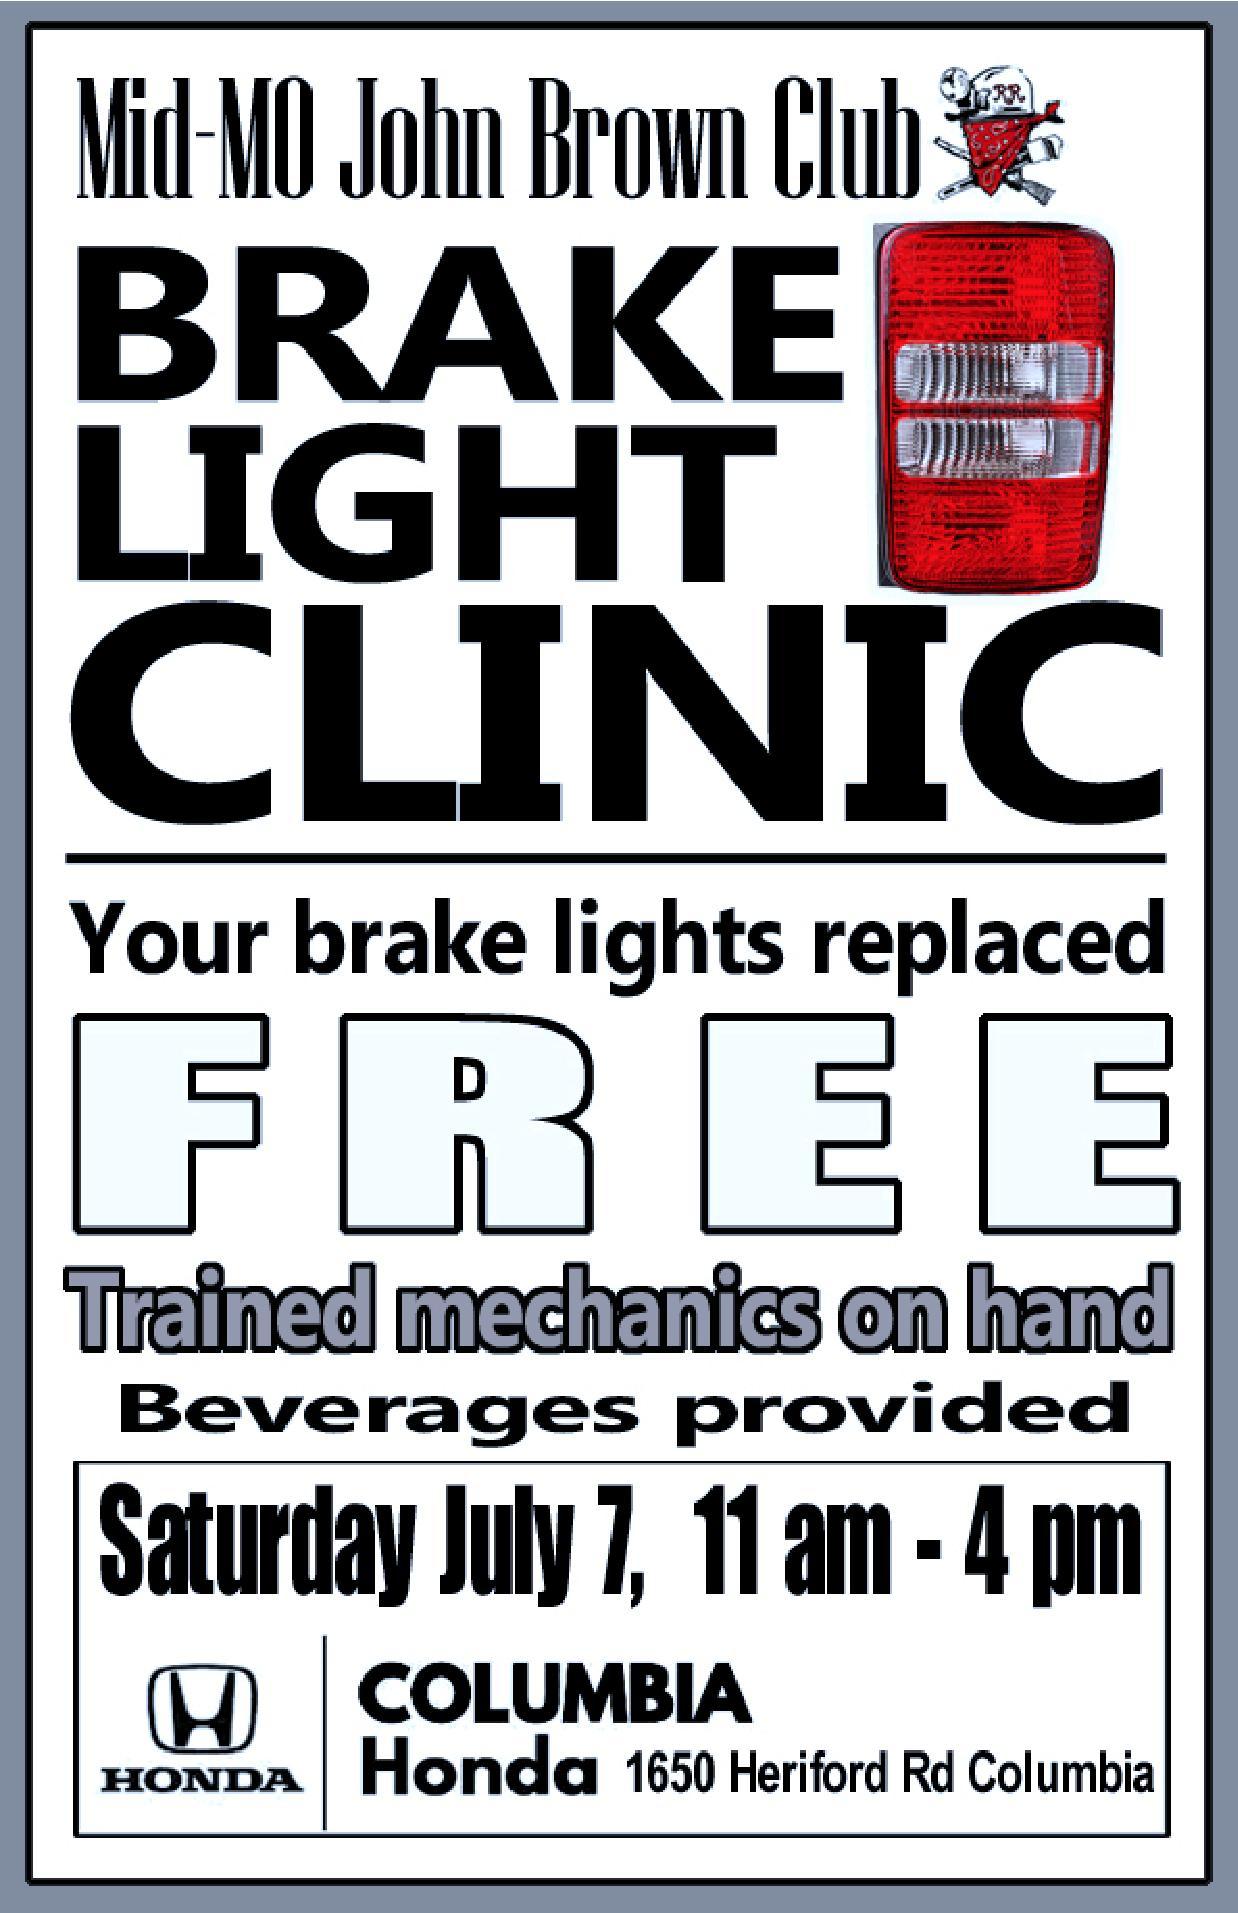 FREE Brake Light Clinic – Saturday 7 7 2018 – Columbia Honda – 11am